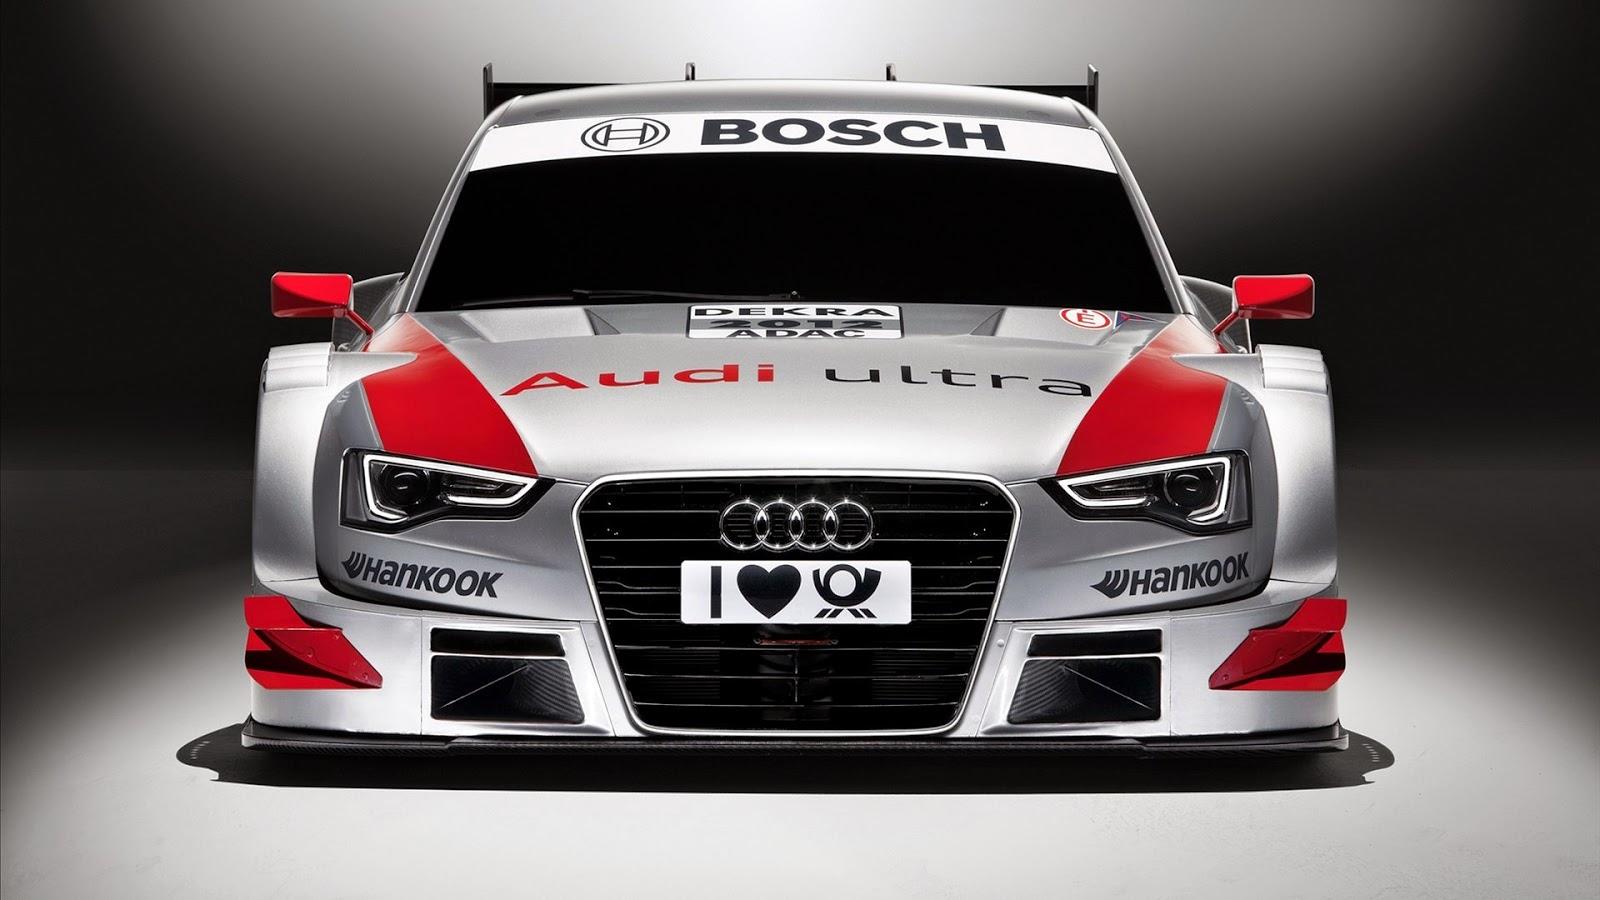 Audi DTM Supercar